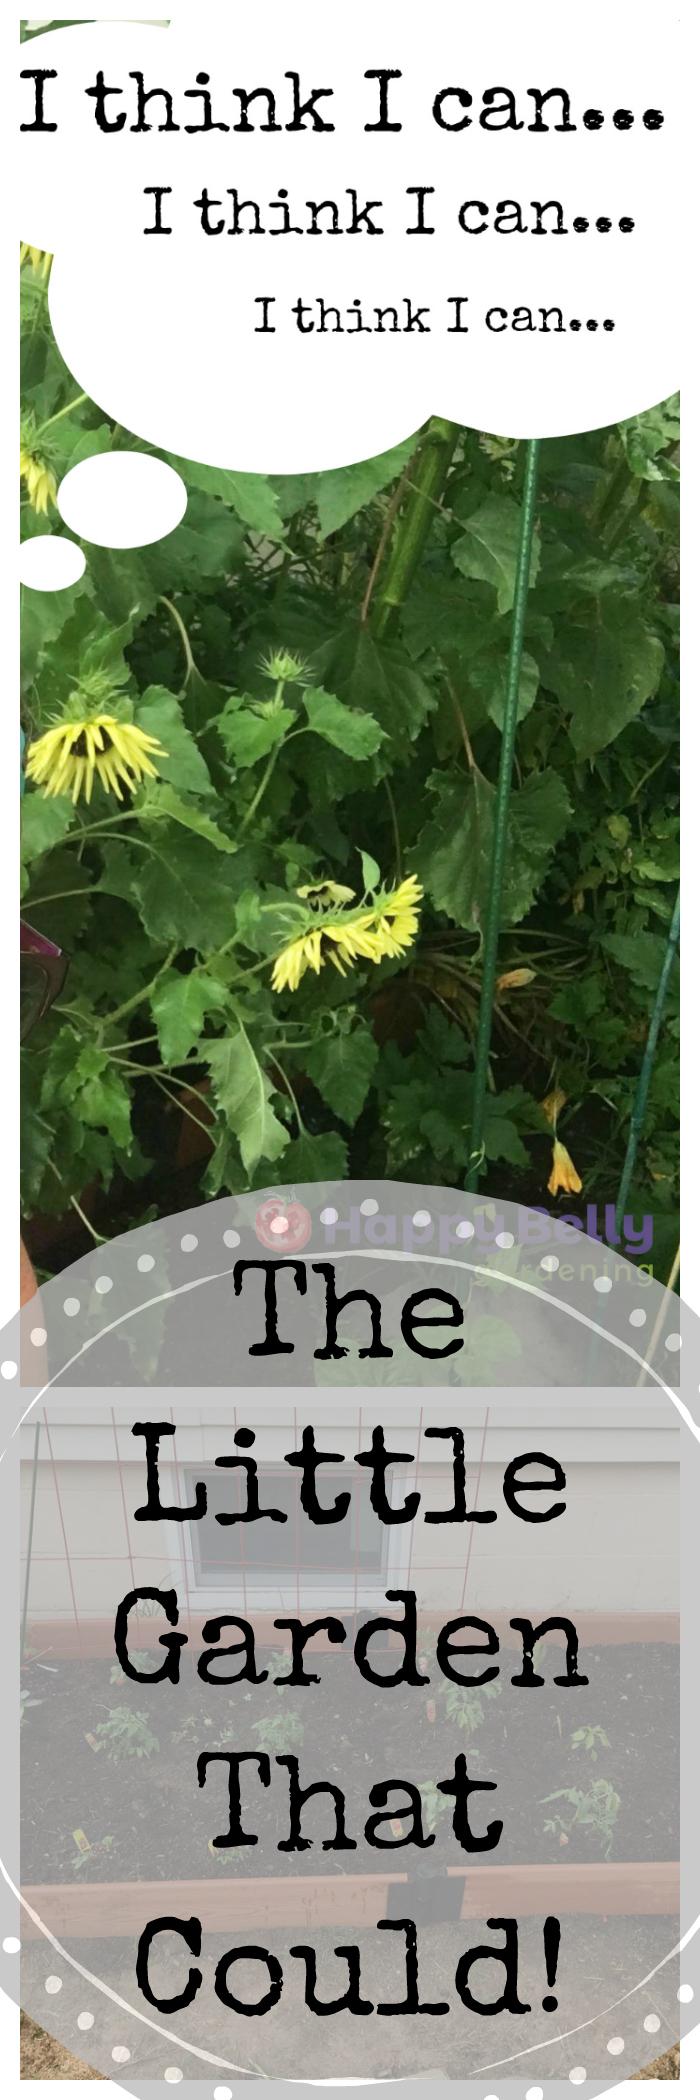 The Little Garden That Could for pinterest.jpg